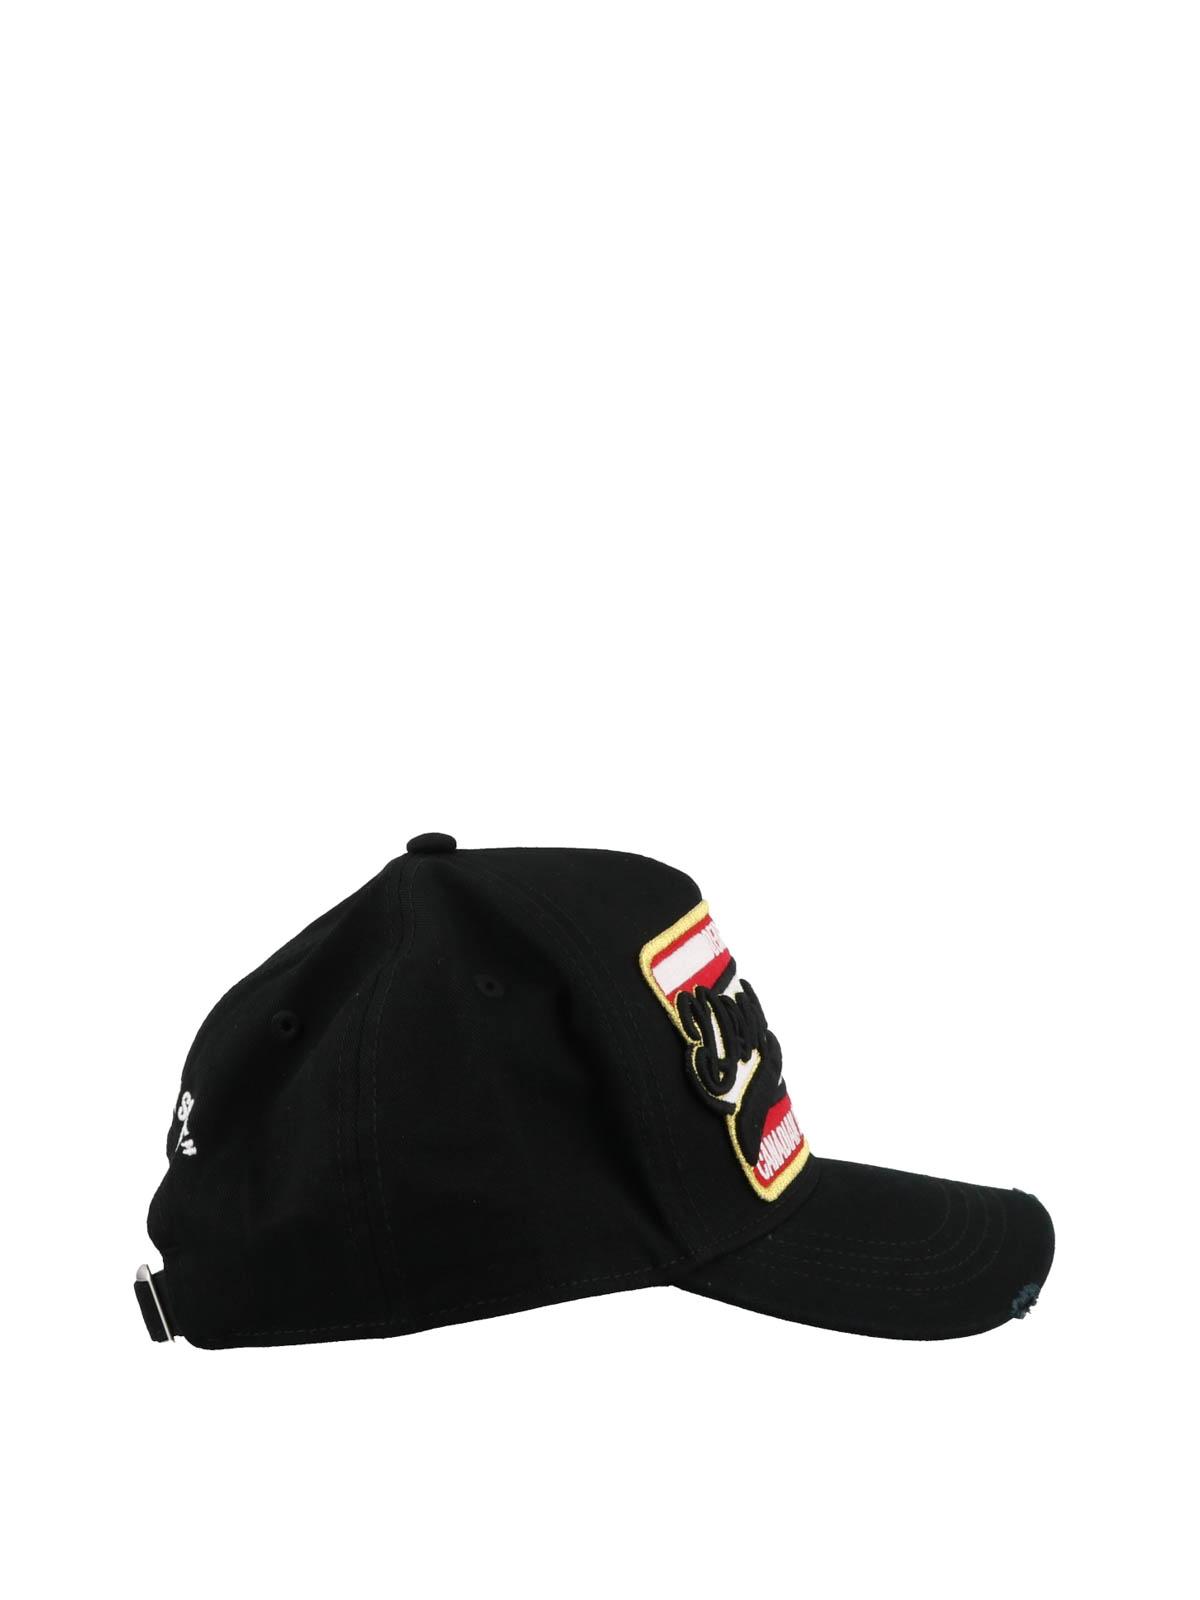 d07ac60ccbf35 DSQUARED2  hats   caps online - Canadian Brothers black baseball cap